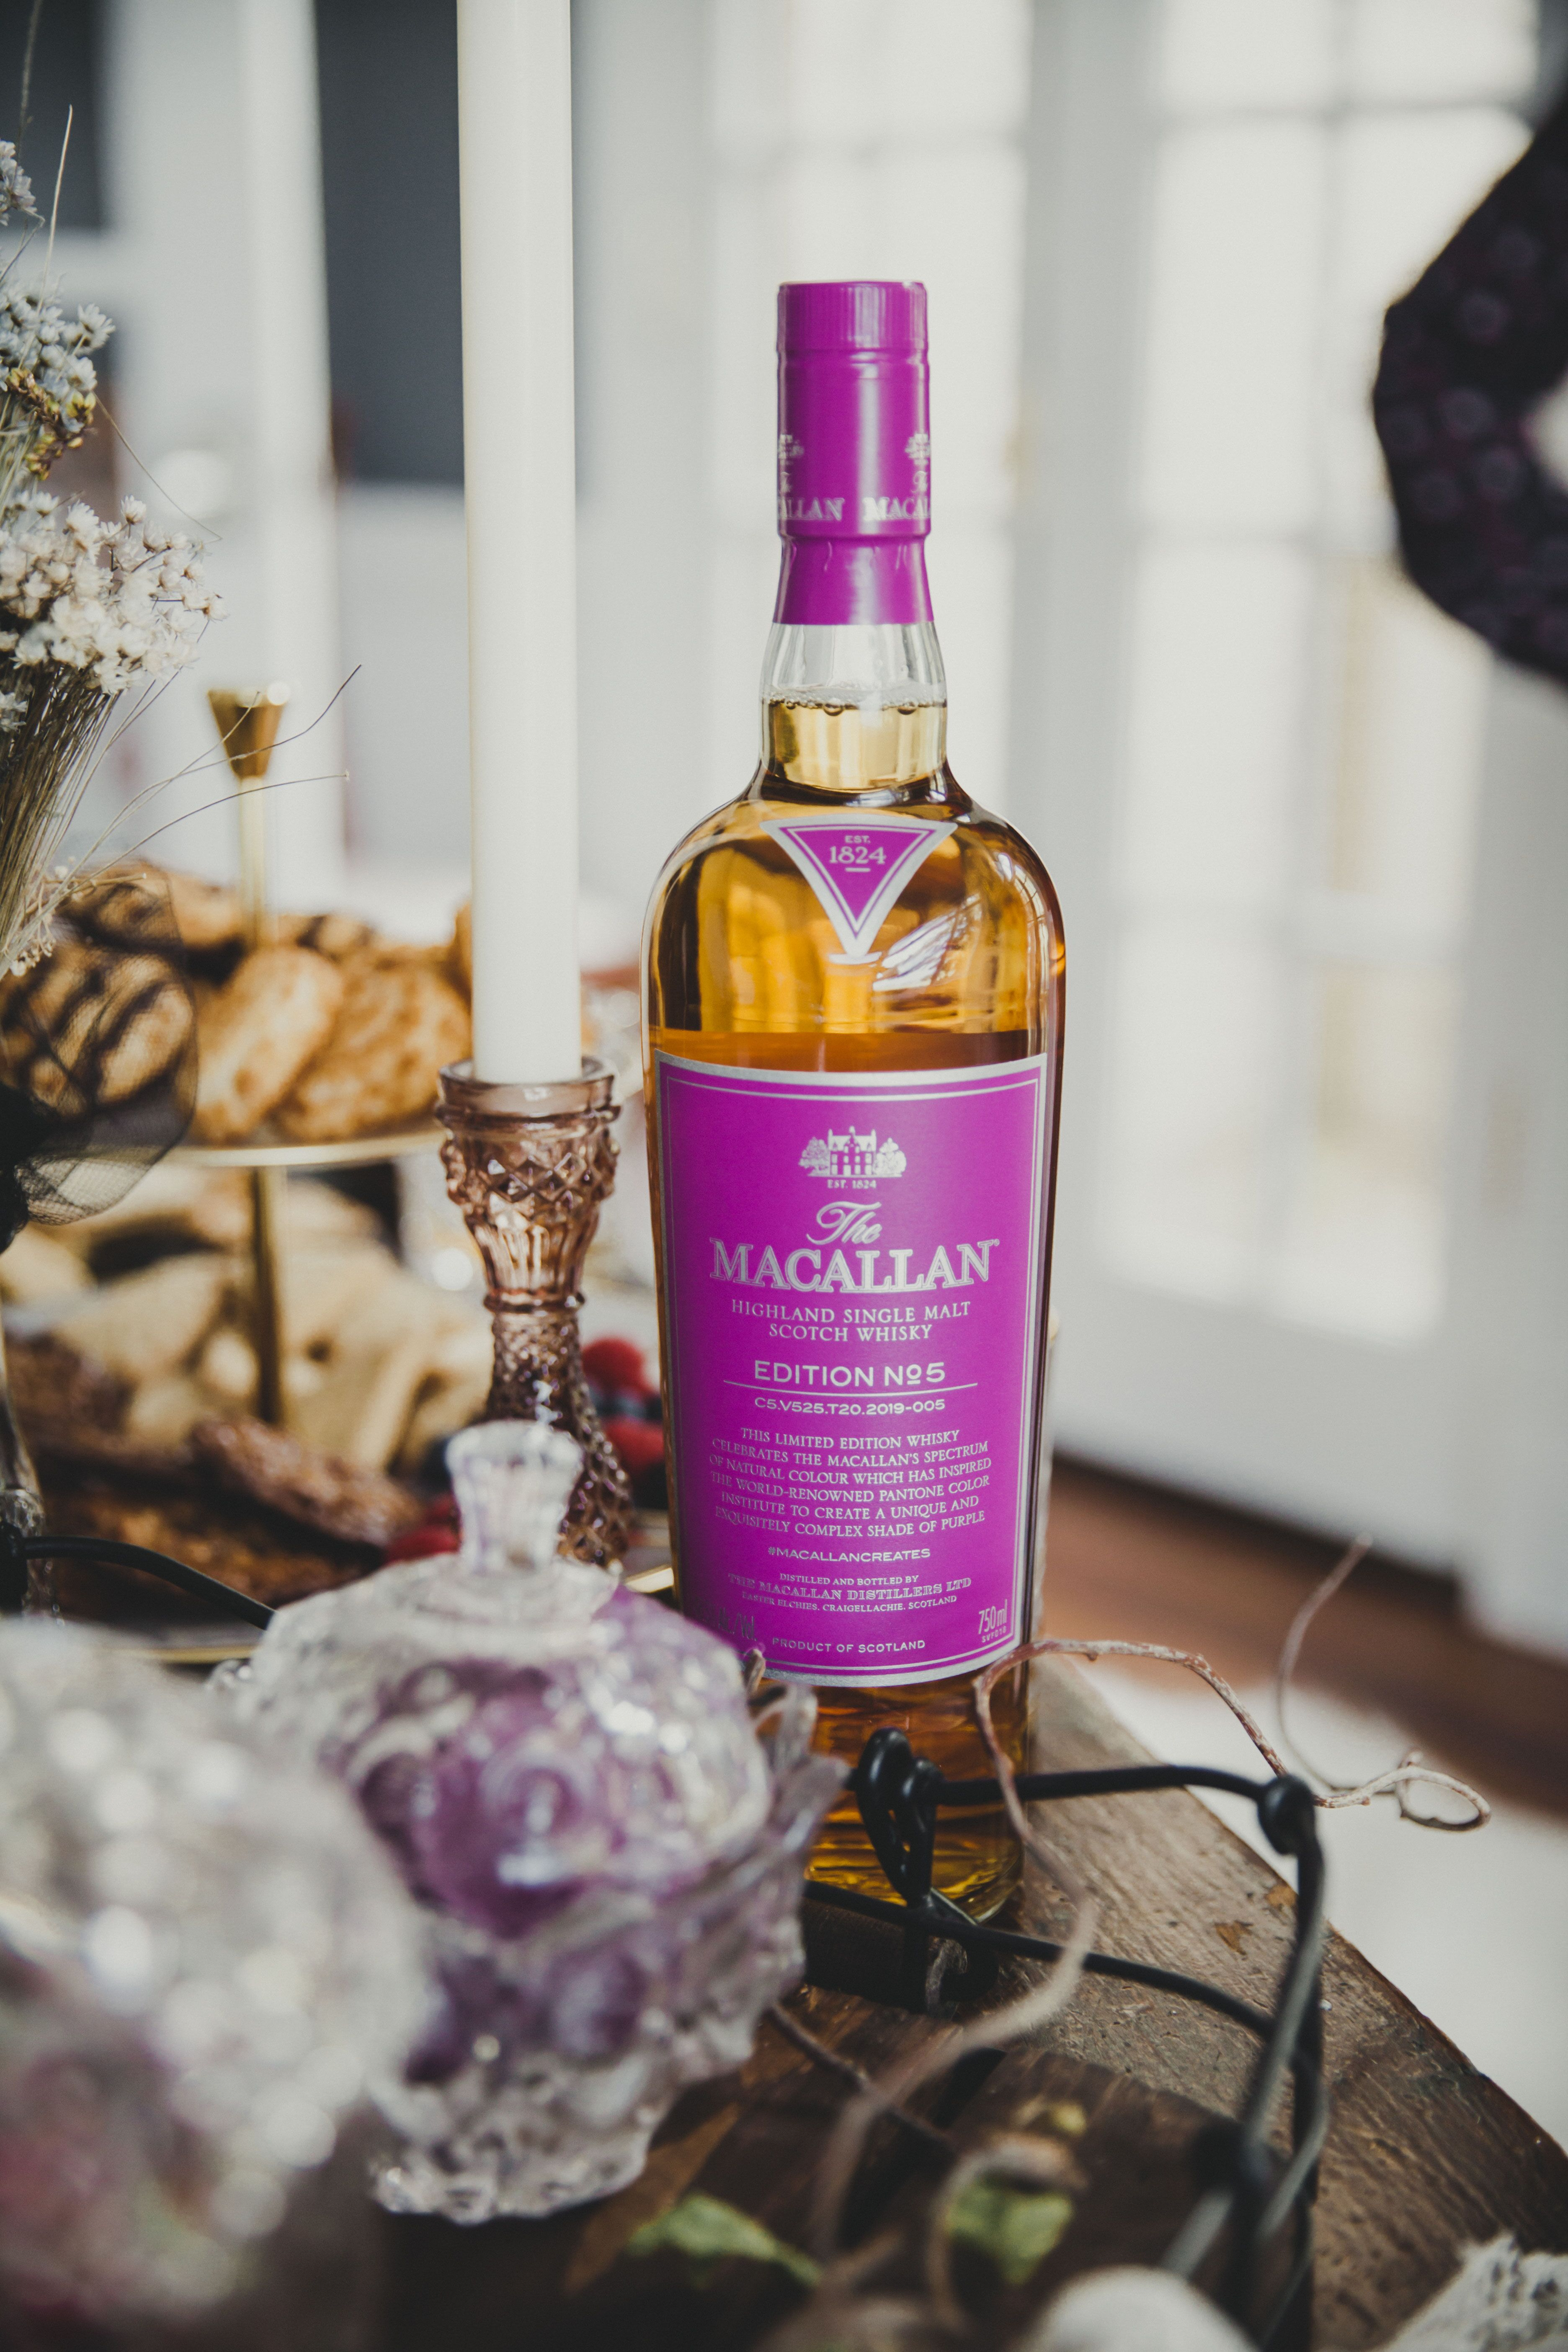 The Macallan edition no.5 whisky